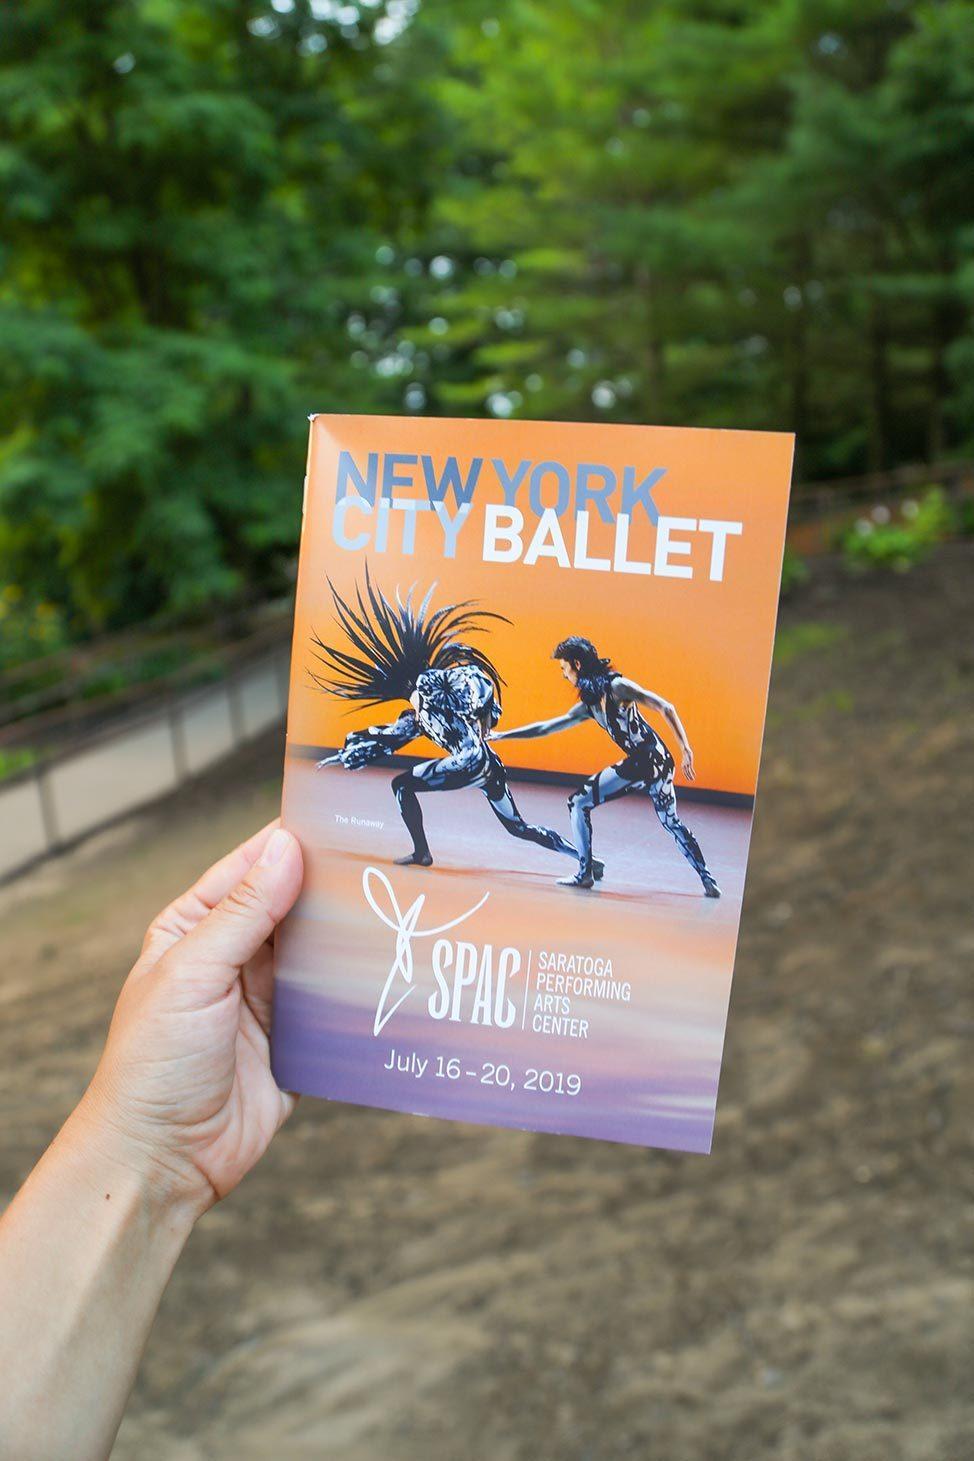 New York City Ballet at SPAC